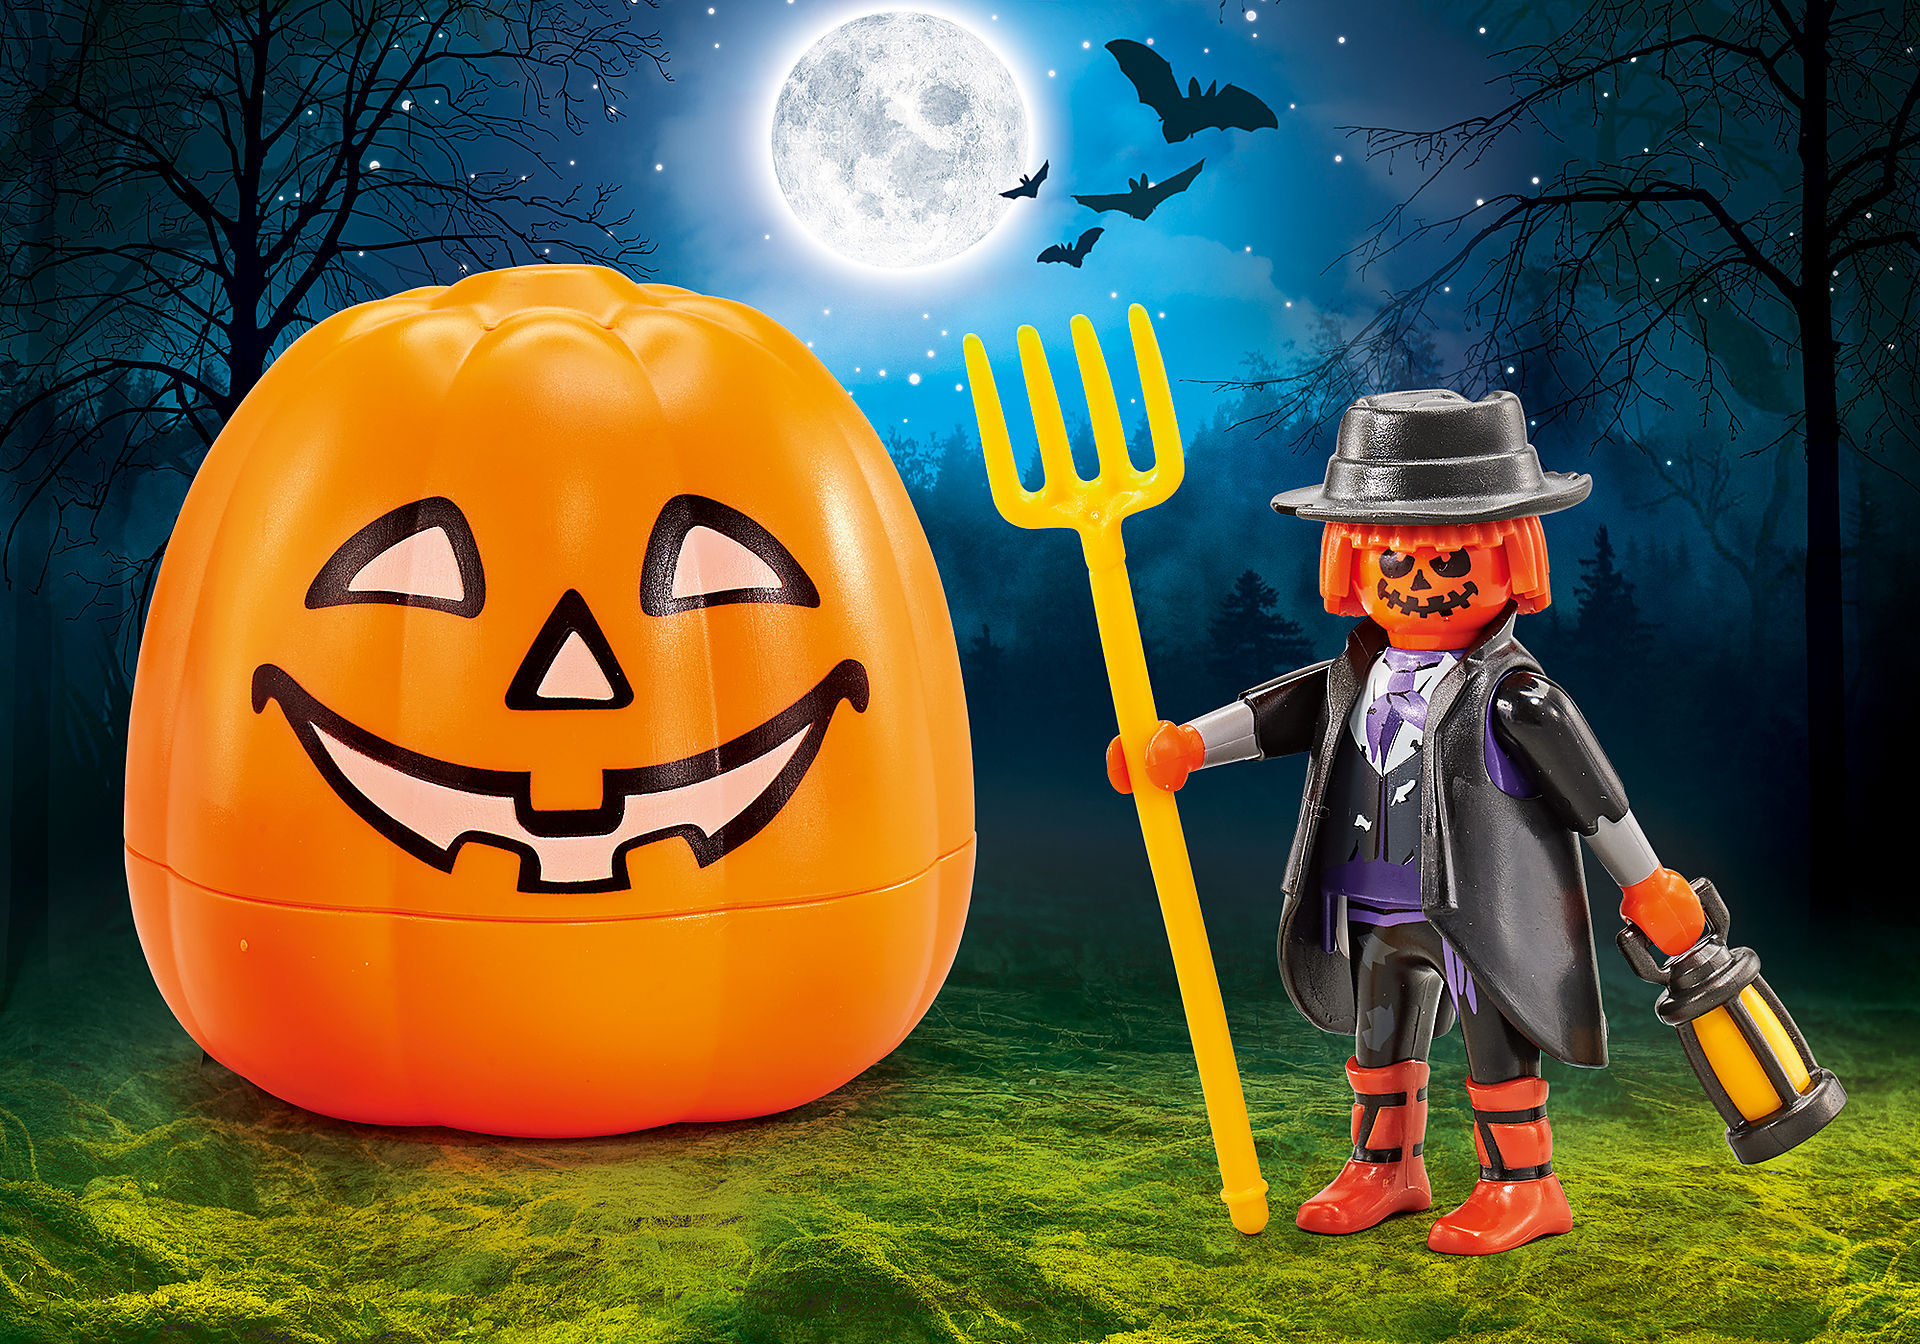 9897 Halloween Pumpkin - Jack o' Lantern zoom image1